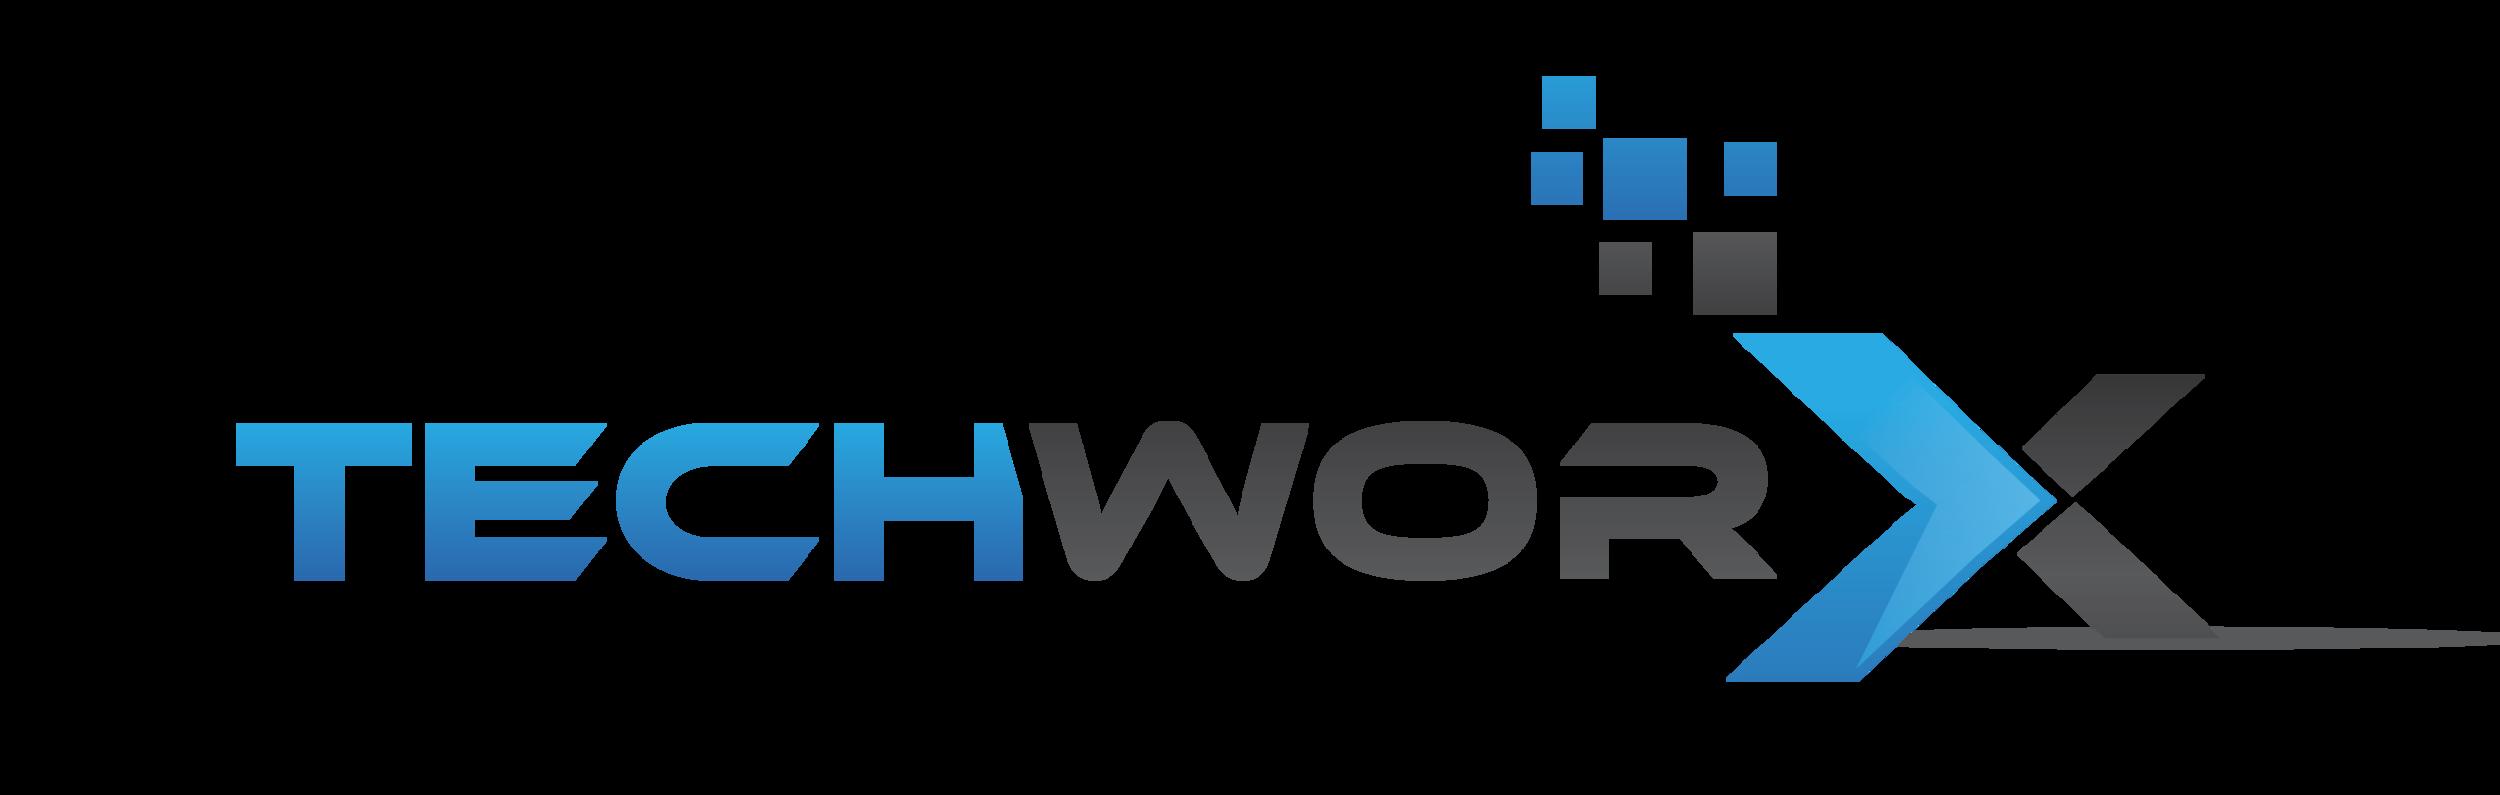 TechWorX---Logo-01.png